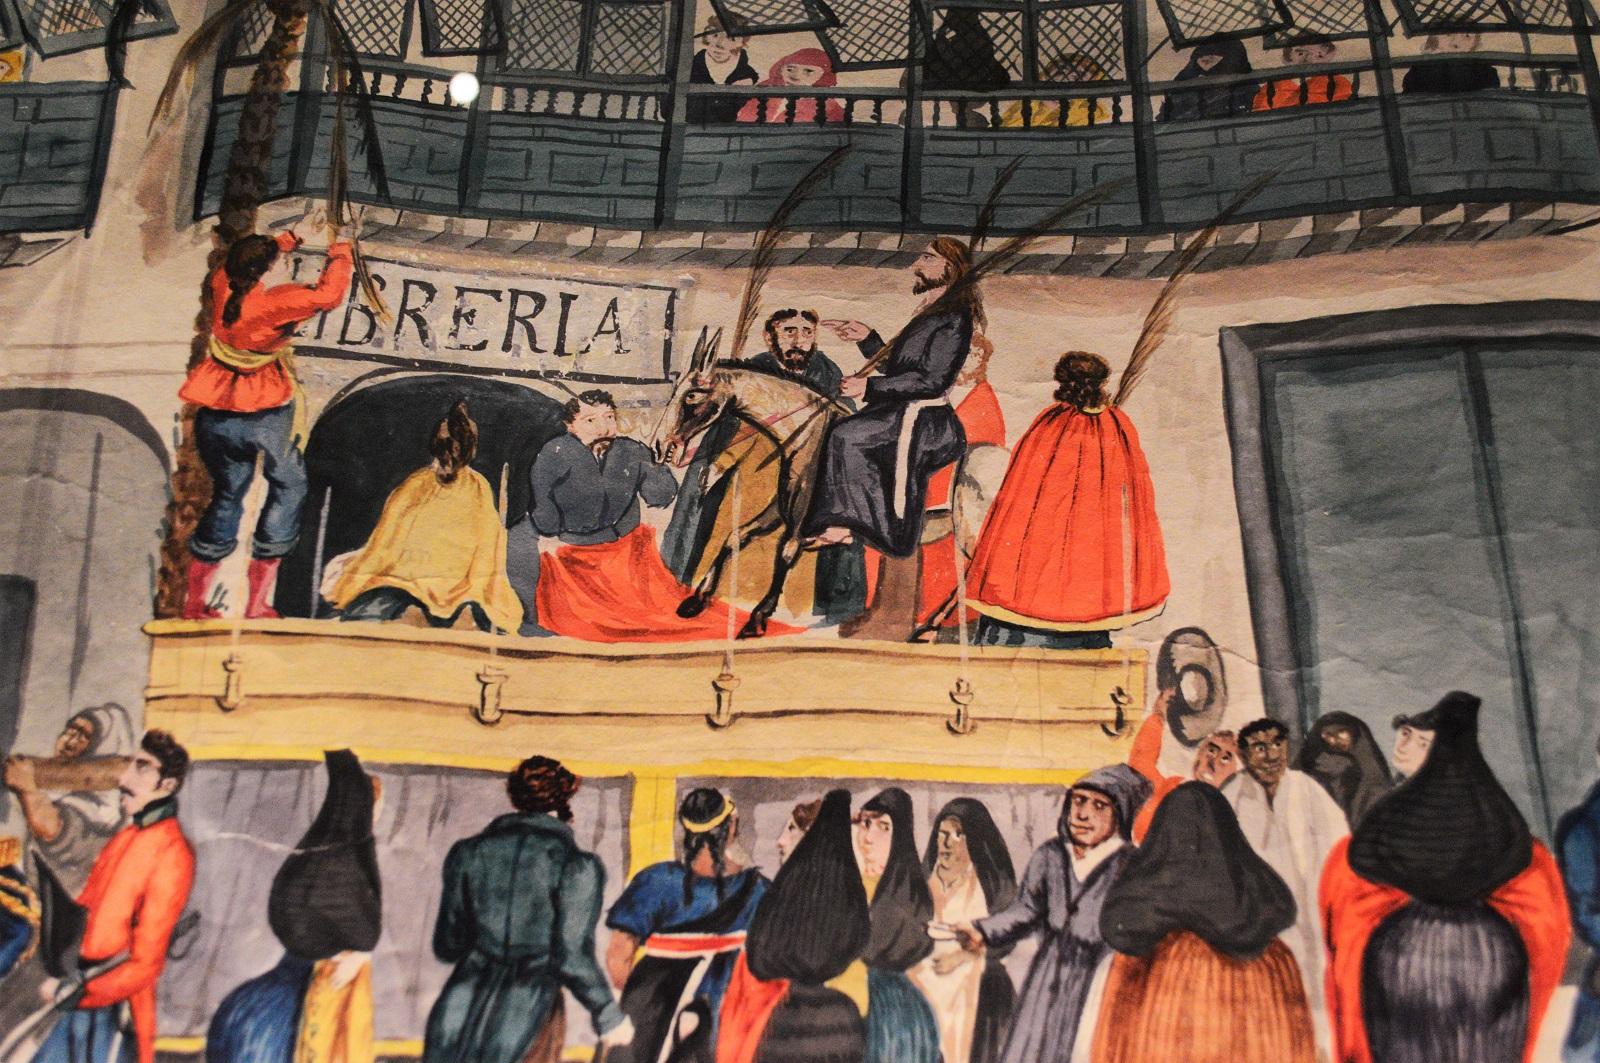 Procesión de Semana Santa en la Calle de San Agustín de Lima Foto Ireli Vázquez